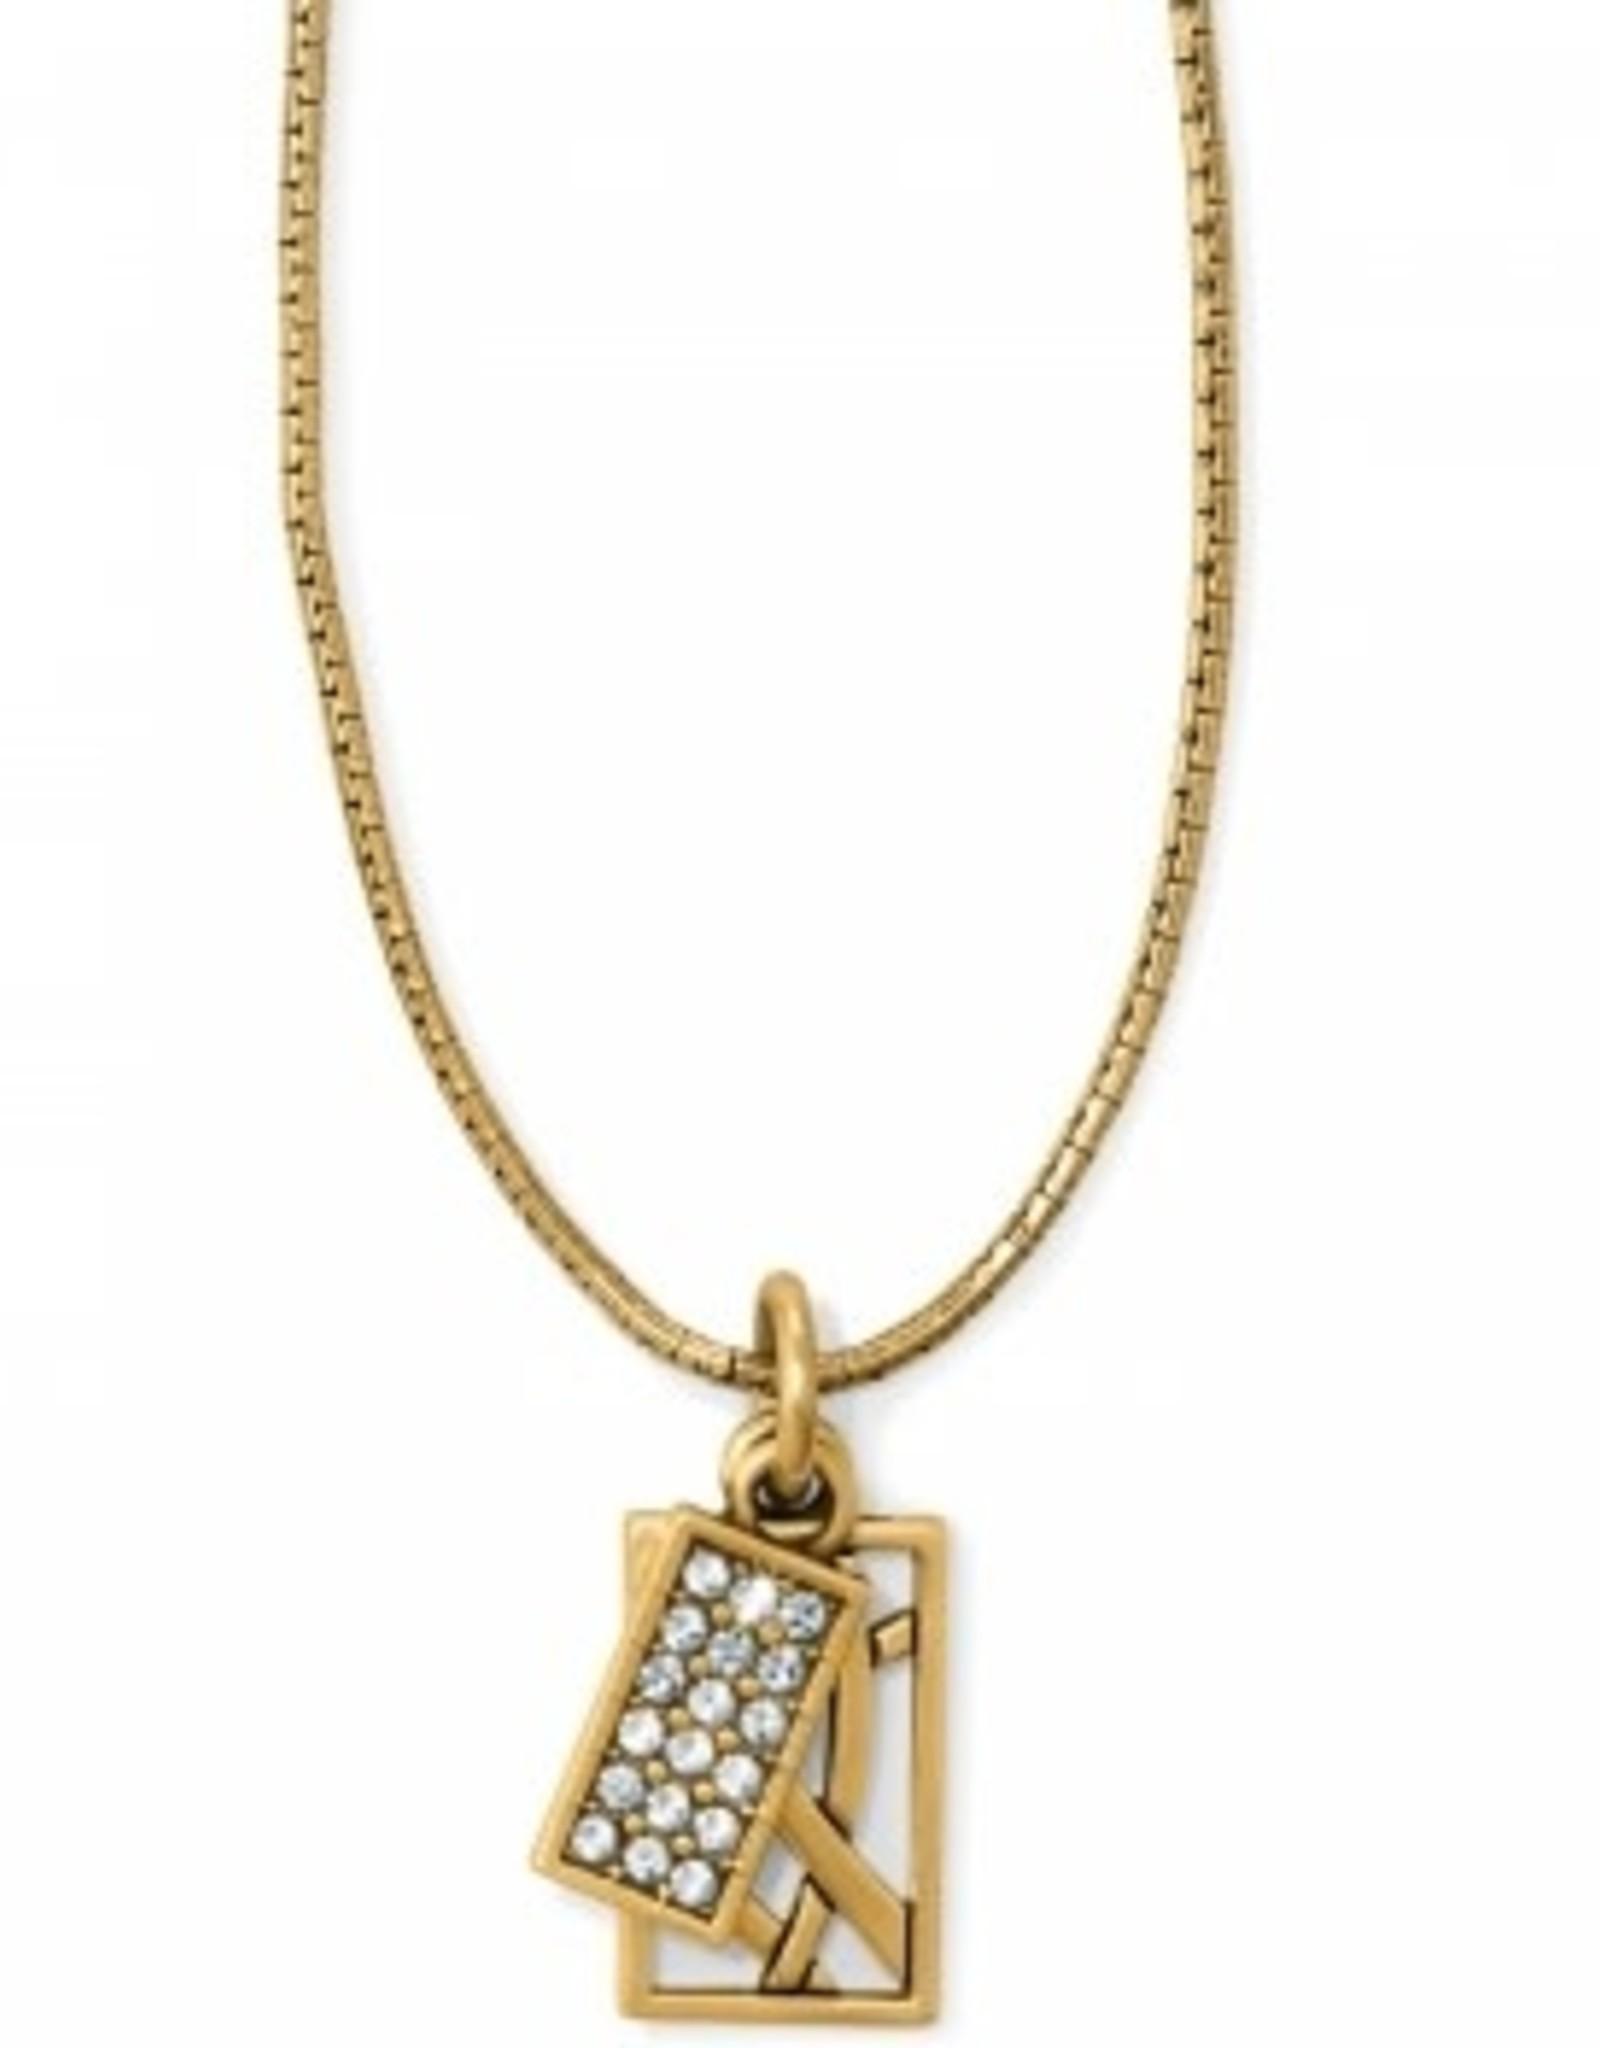 Brighton Brighton, Meridian Zenith Charm Necklace, Gold